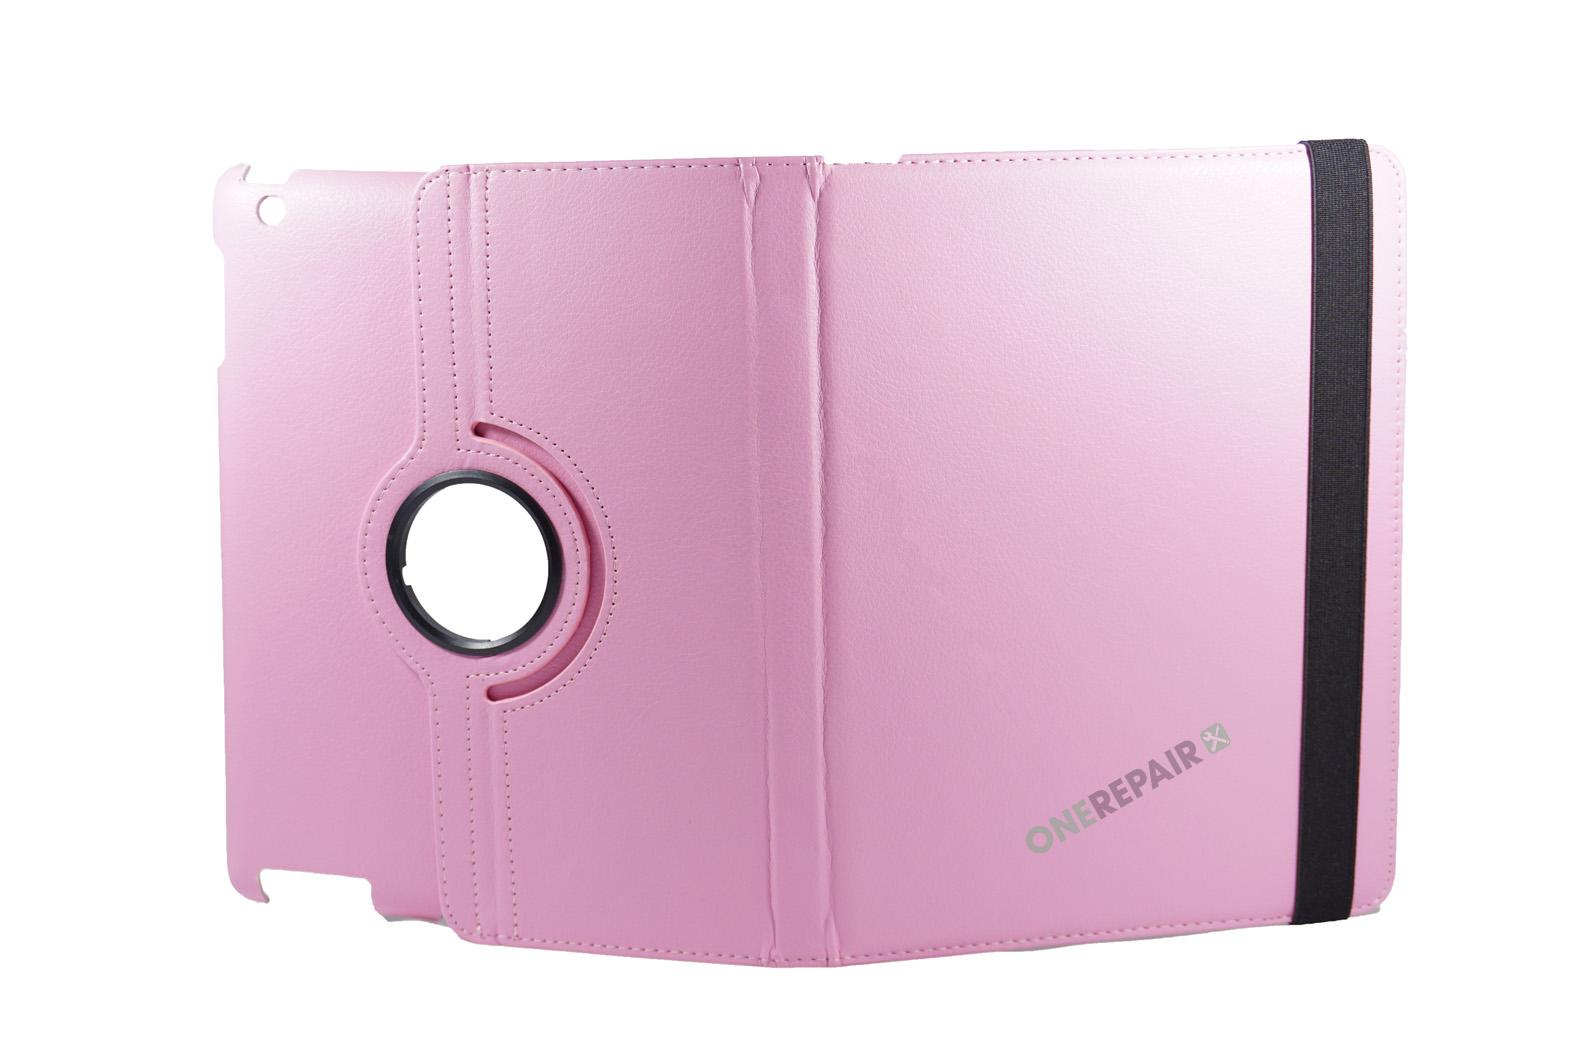 351033_iPad_2_3_4_A1395_A1396_A1430_A1403_1458_A1459_A1460_A1397_Flipcover_Classic_360_Cover_Lyseroed_Pink_Billig_Godt_Beskyttelse_OneRepair_WM_00004